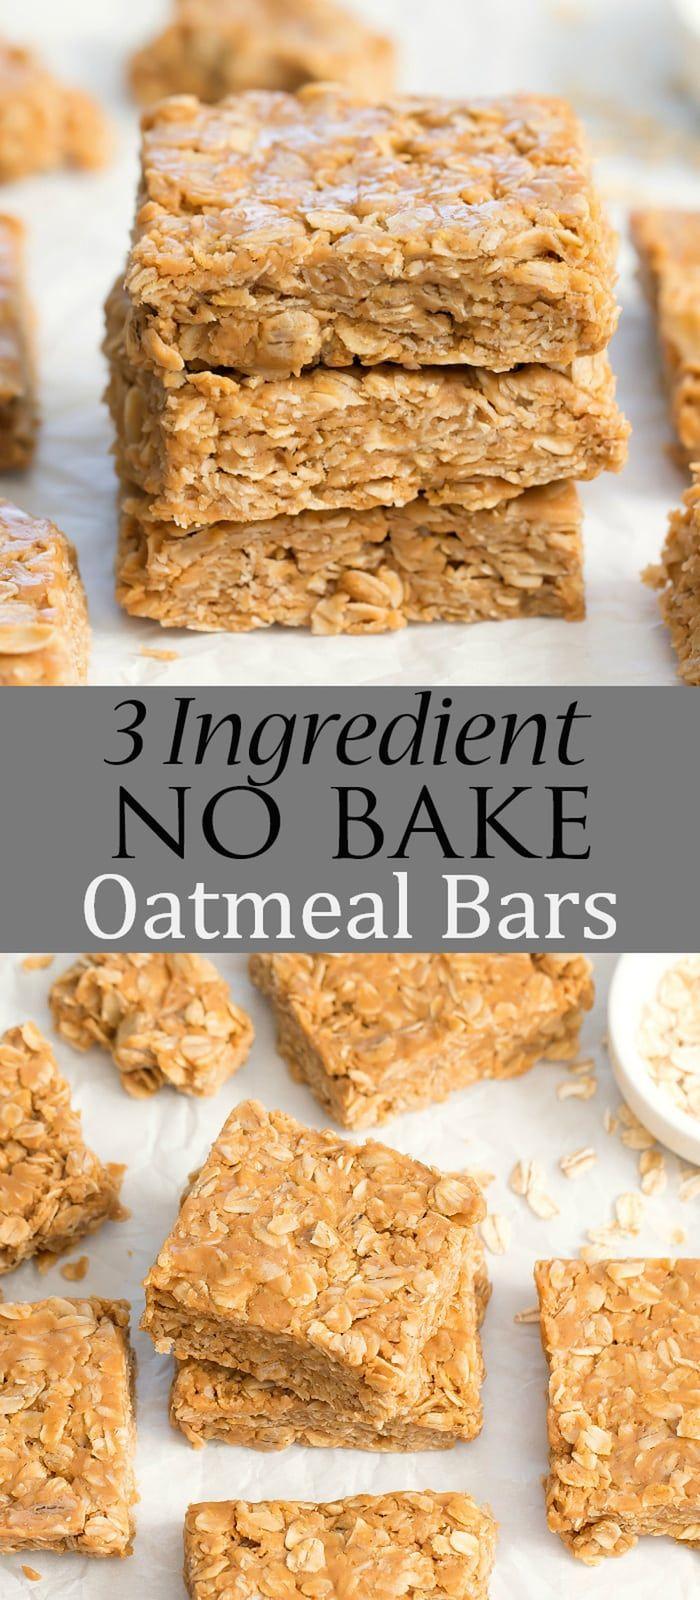 3 Ingredient No Bake Oatmeal Bars